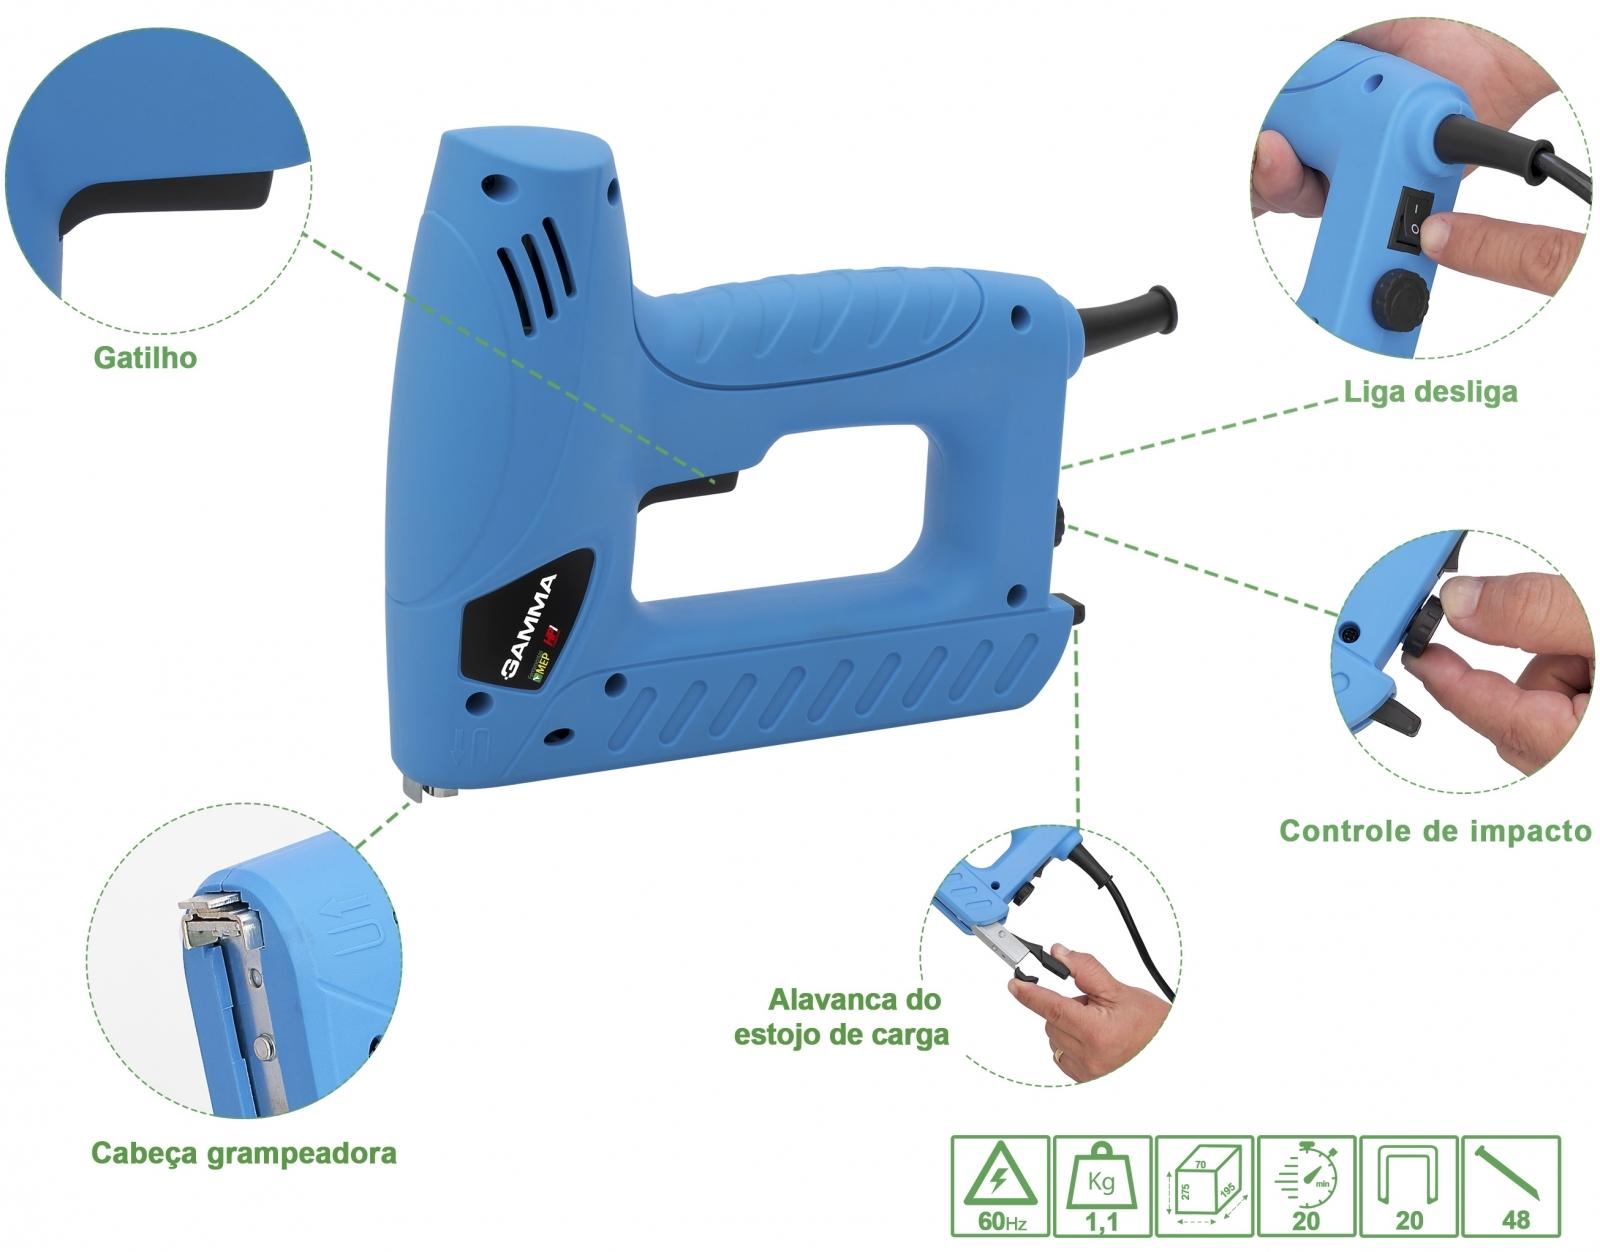 Grampeador e Pinador Elétrico Tapeceiro + Grampos + Pinos - Ferramentas MEP